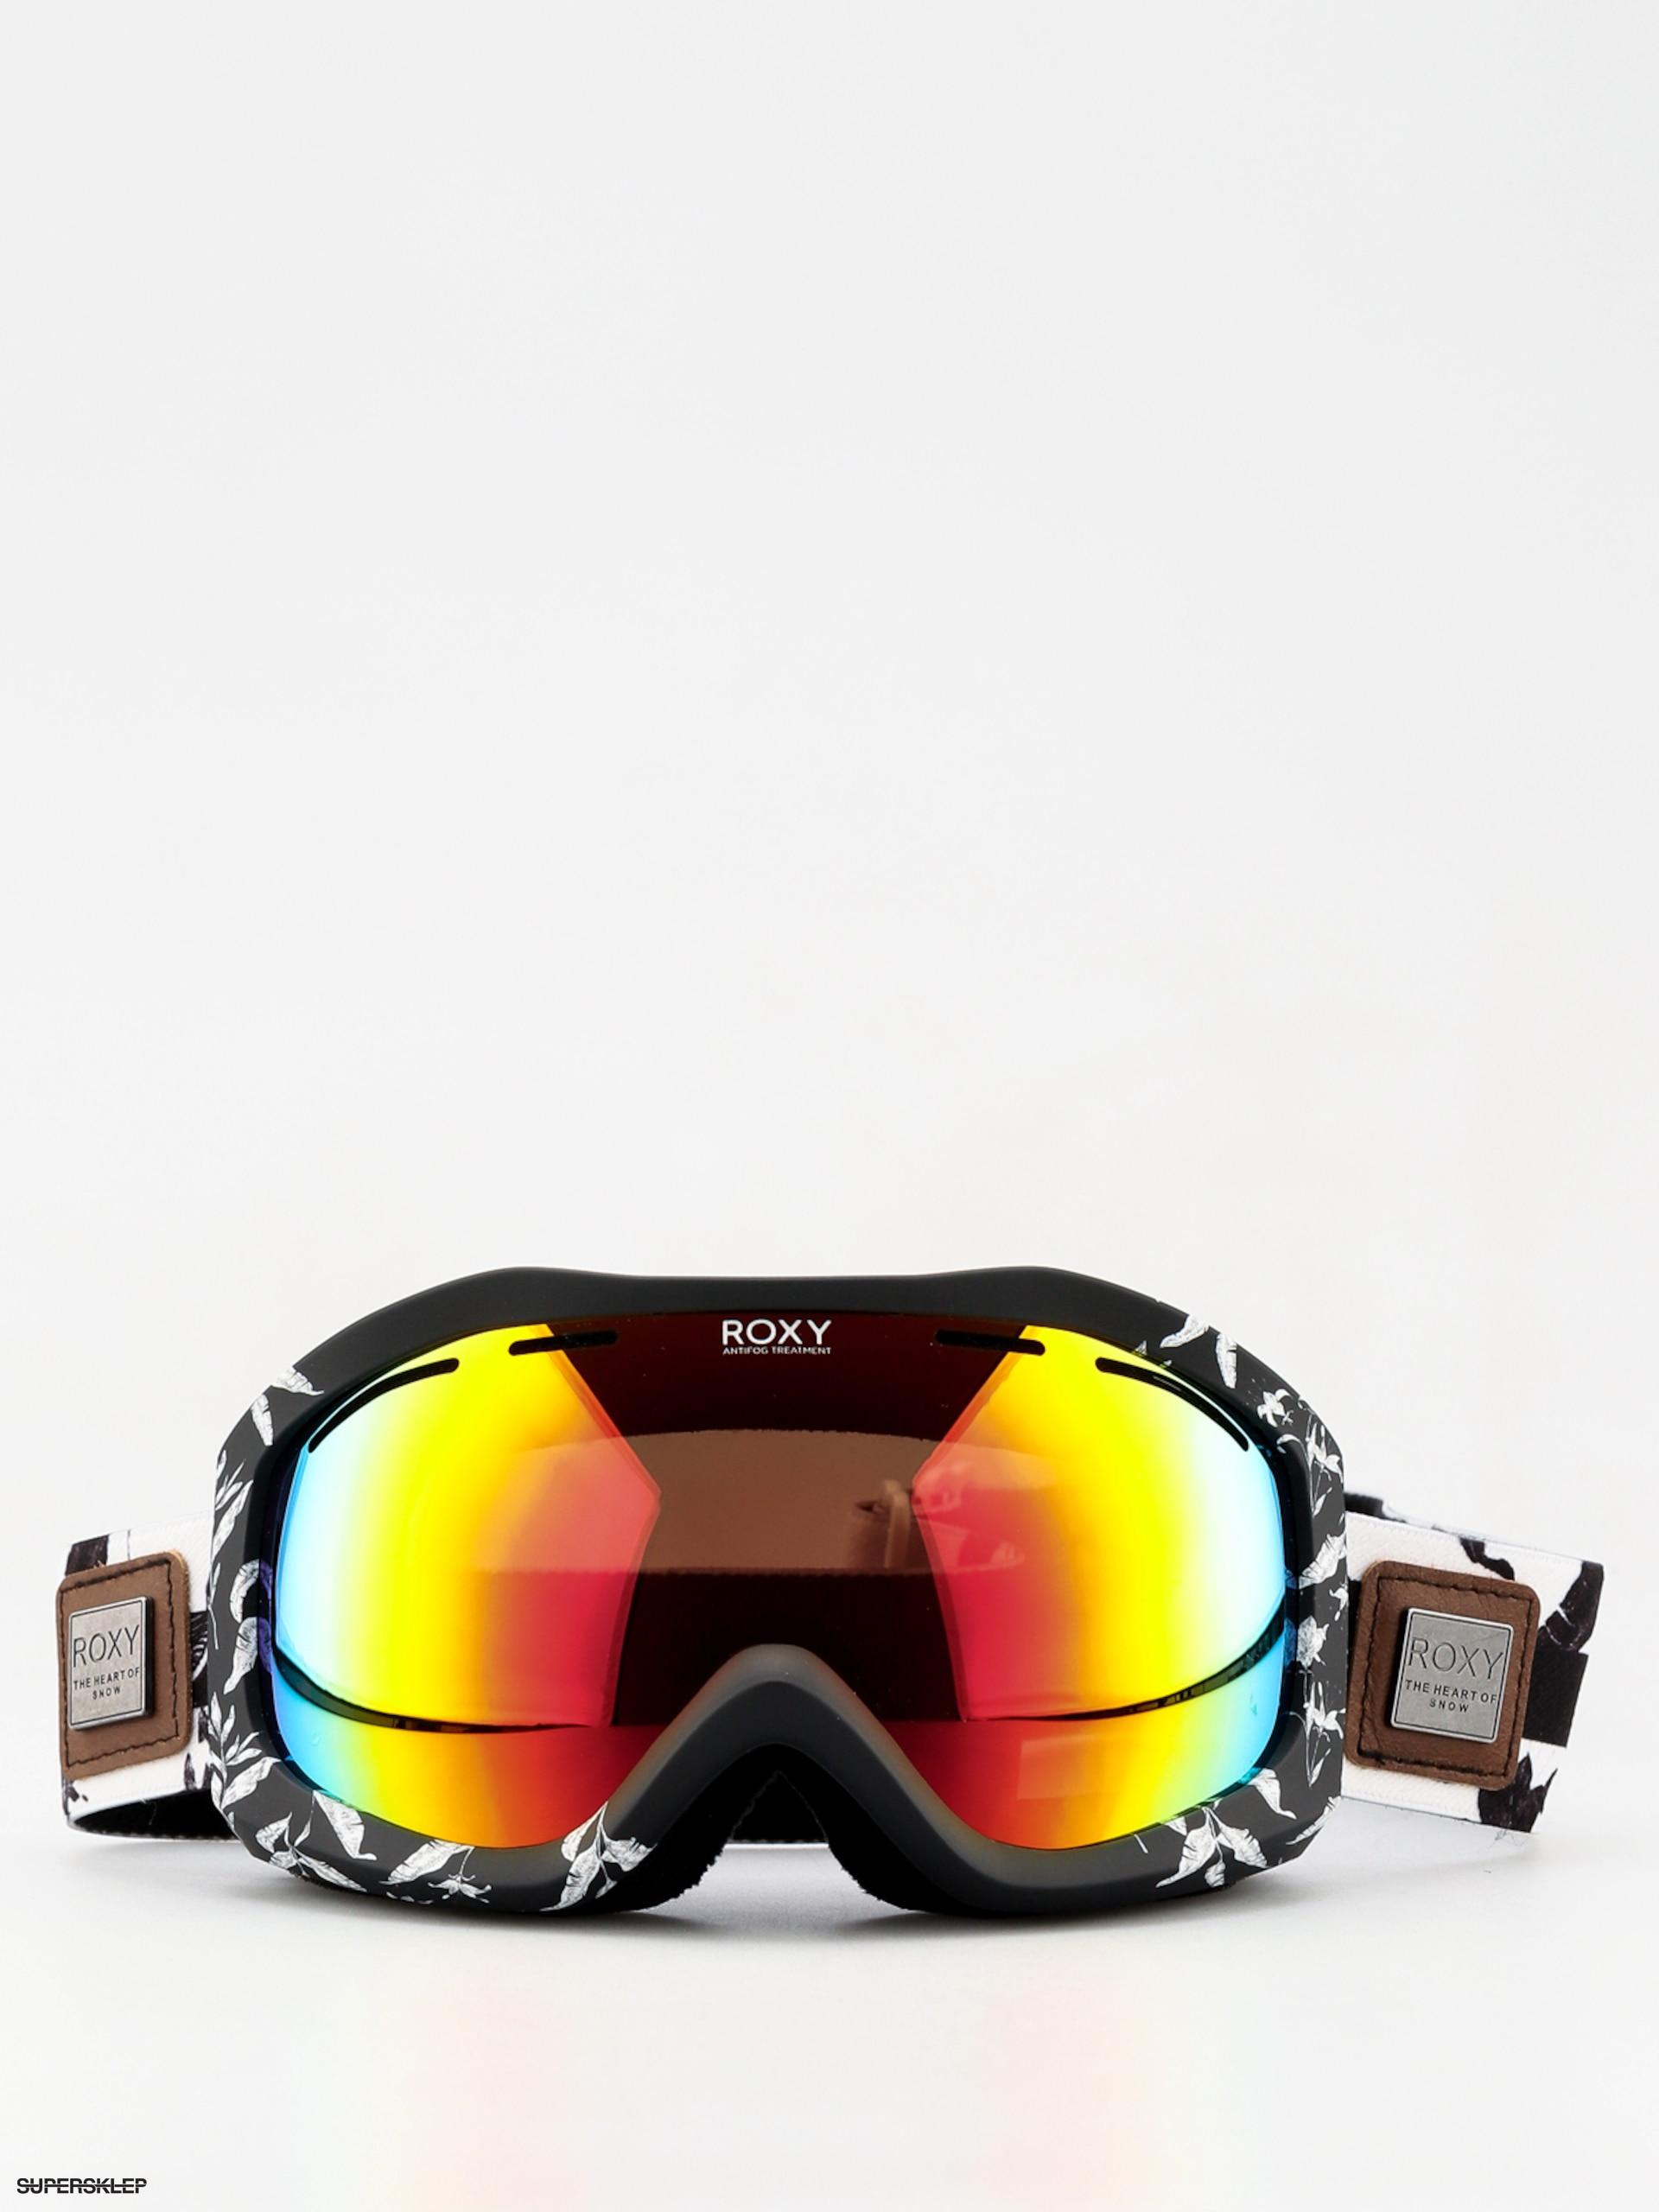 fe425ddfc Okuliare na snowboard Roxy Sunset Art Wmn (love letter)